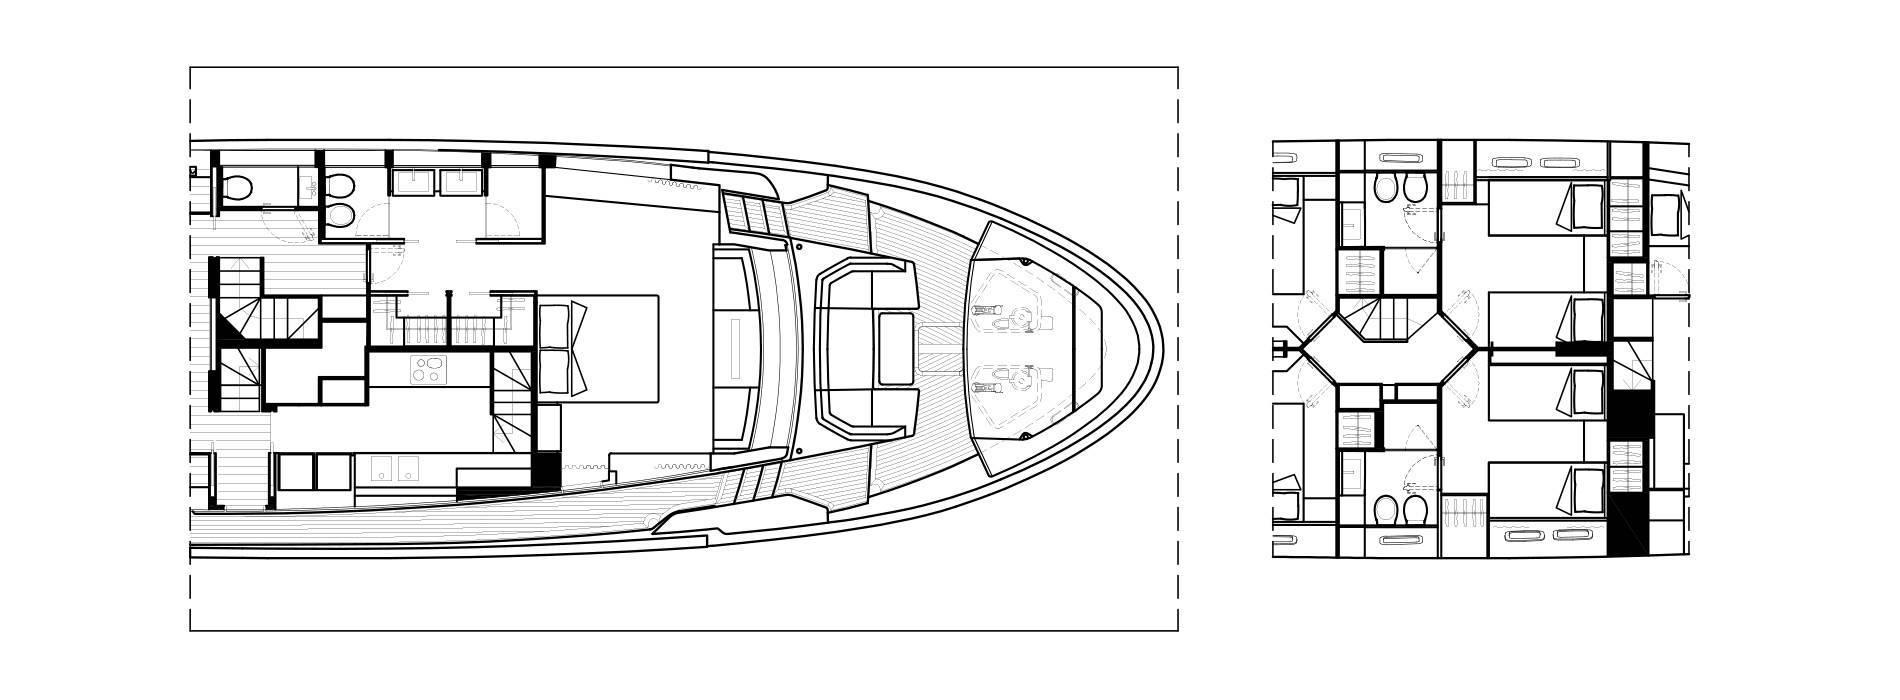 Sanlorenzo Yachts SL102 Детали